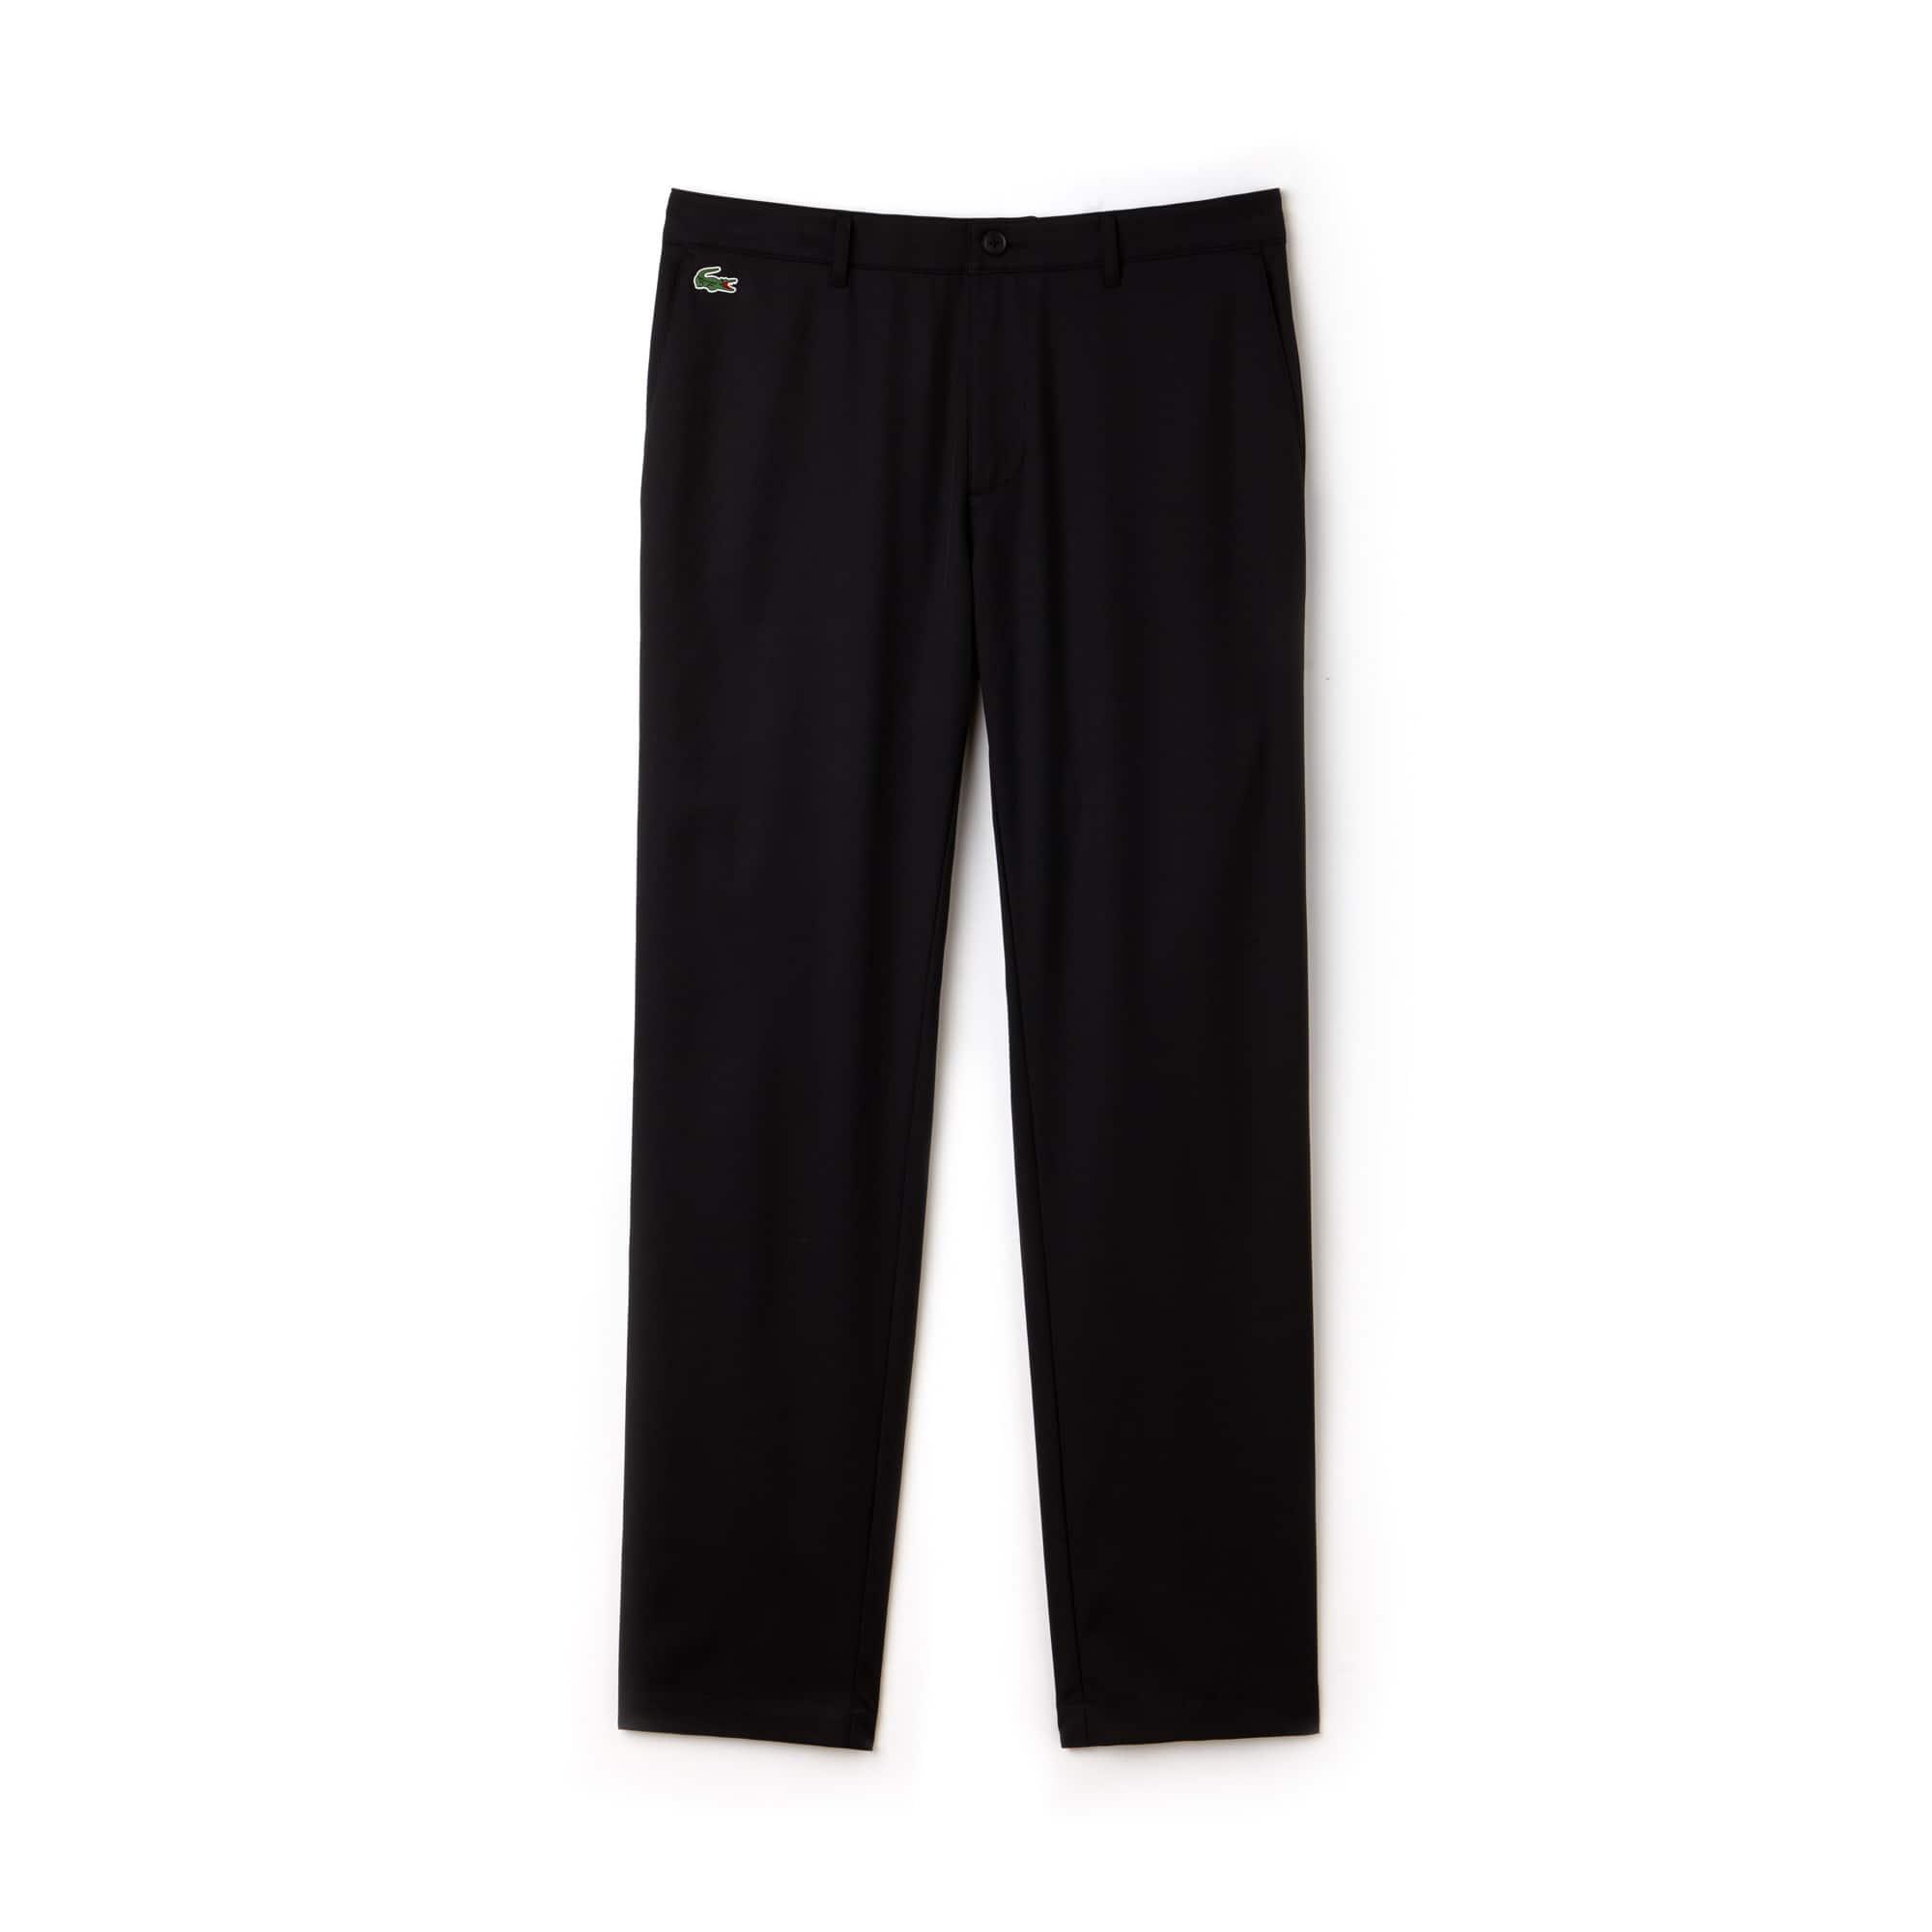 Pantaloni chino Golf Lacoste SPORT in gabardina tecnica tinta unita